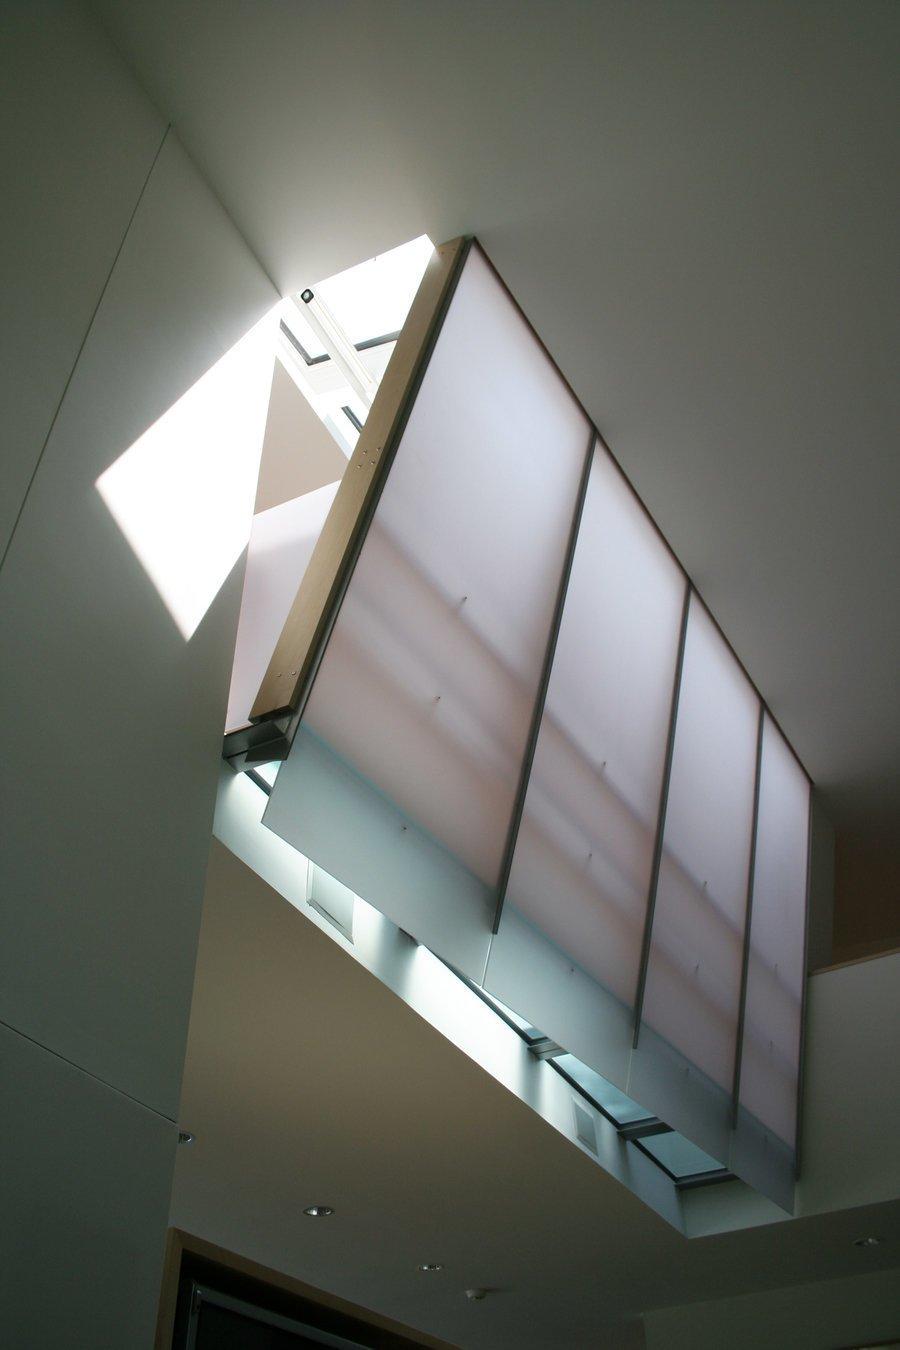 #window #light #bright #interior #inside #indoor #Princeton #NewJersey #GarrisonArchitects  Iversen Kaplan Residence